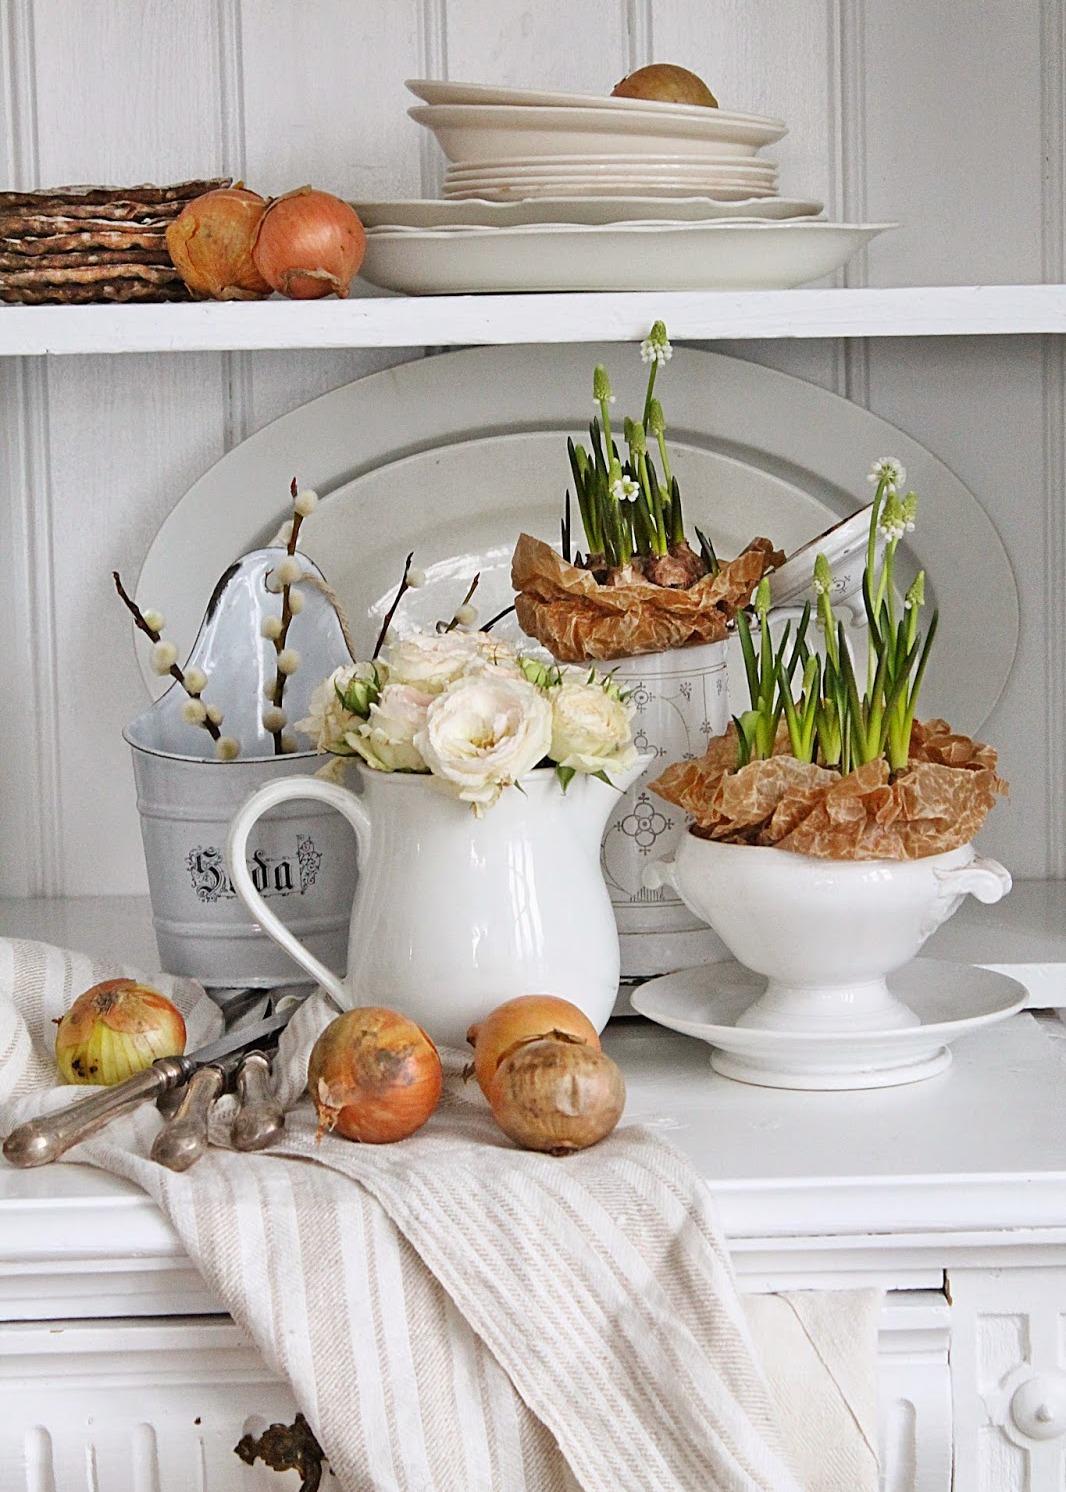 dekor/vesennii-dekor-svoimi-rukami-foto-3.jpg